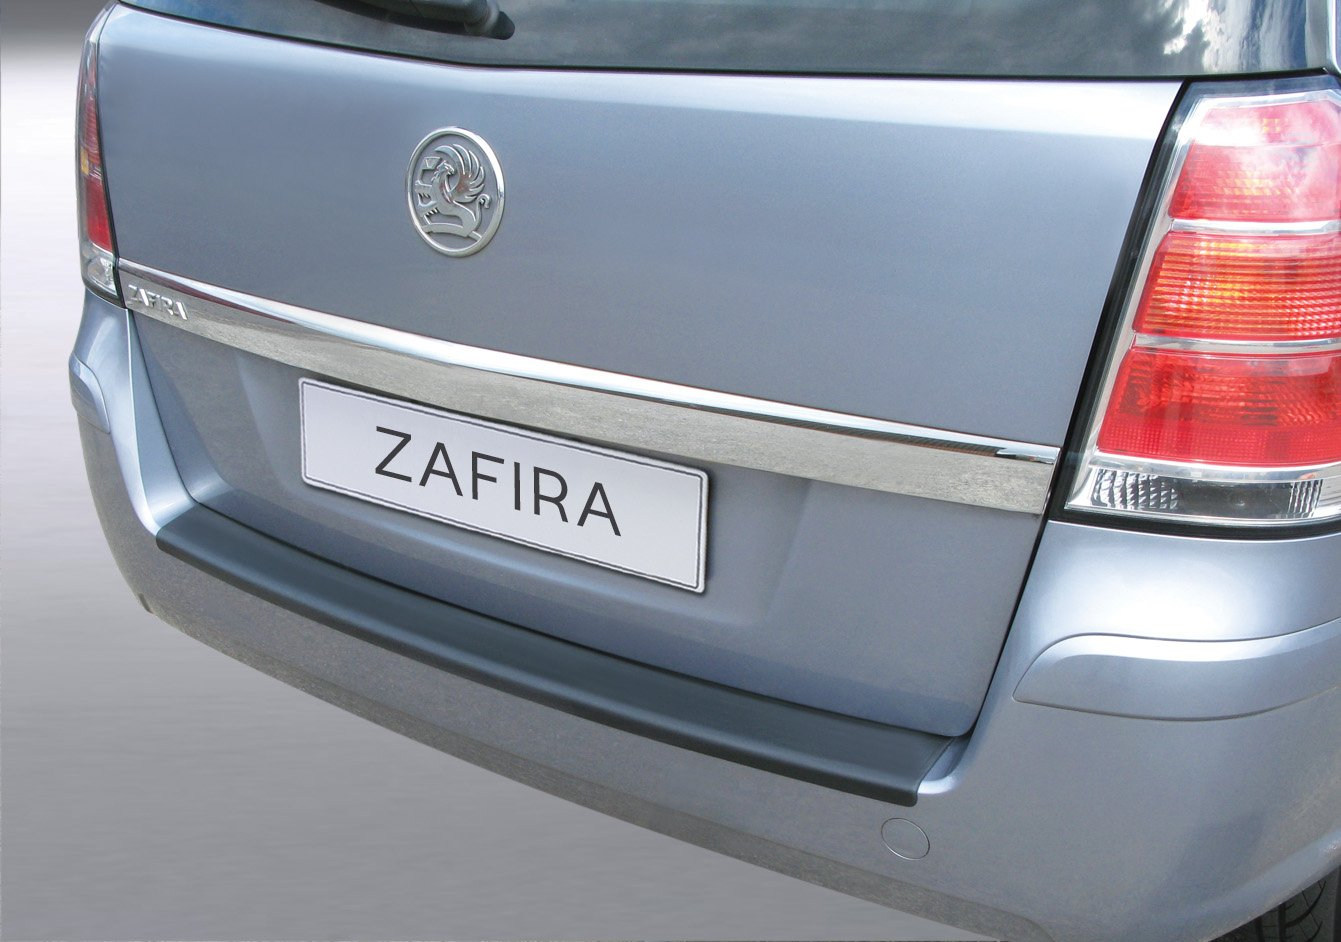 Opel Zafira B 2005 ABS Argent Protection de seuil arri/ère